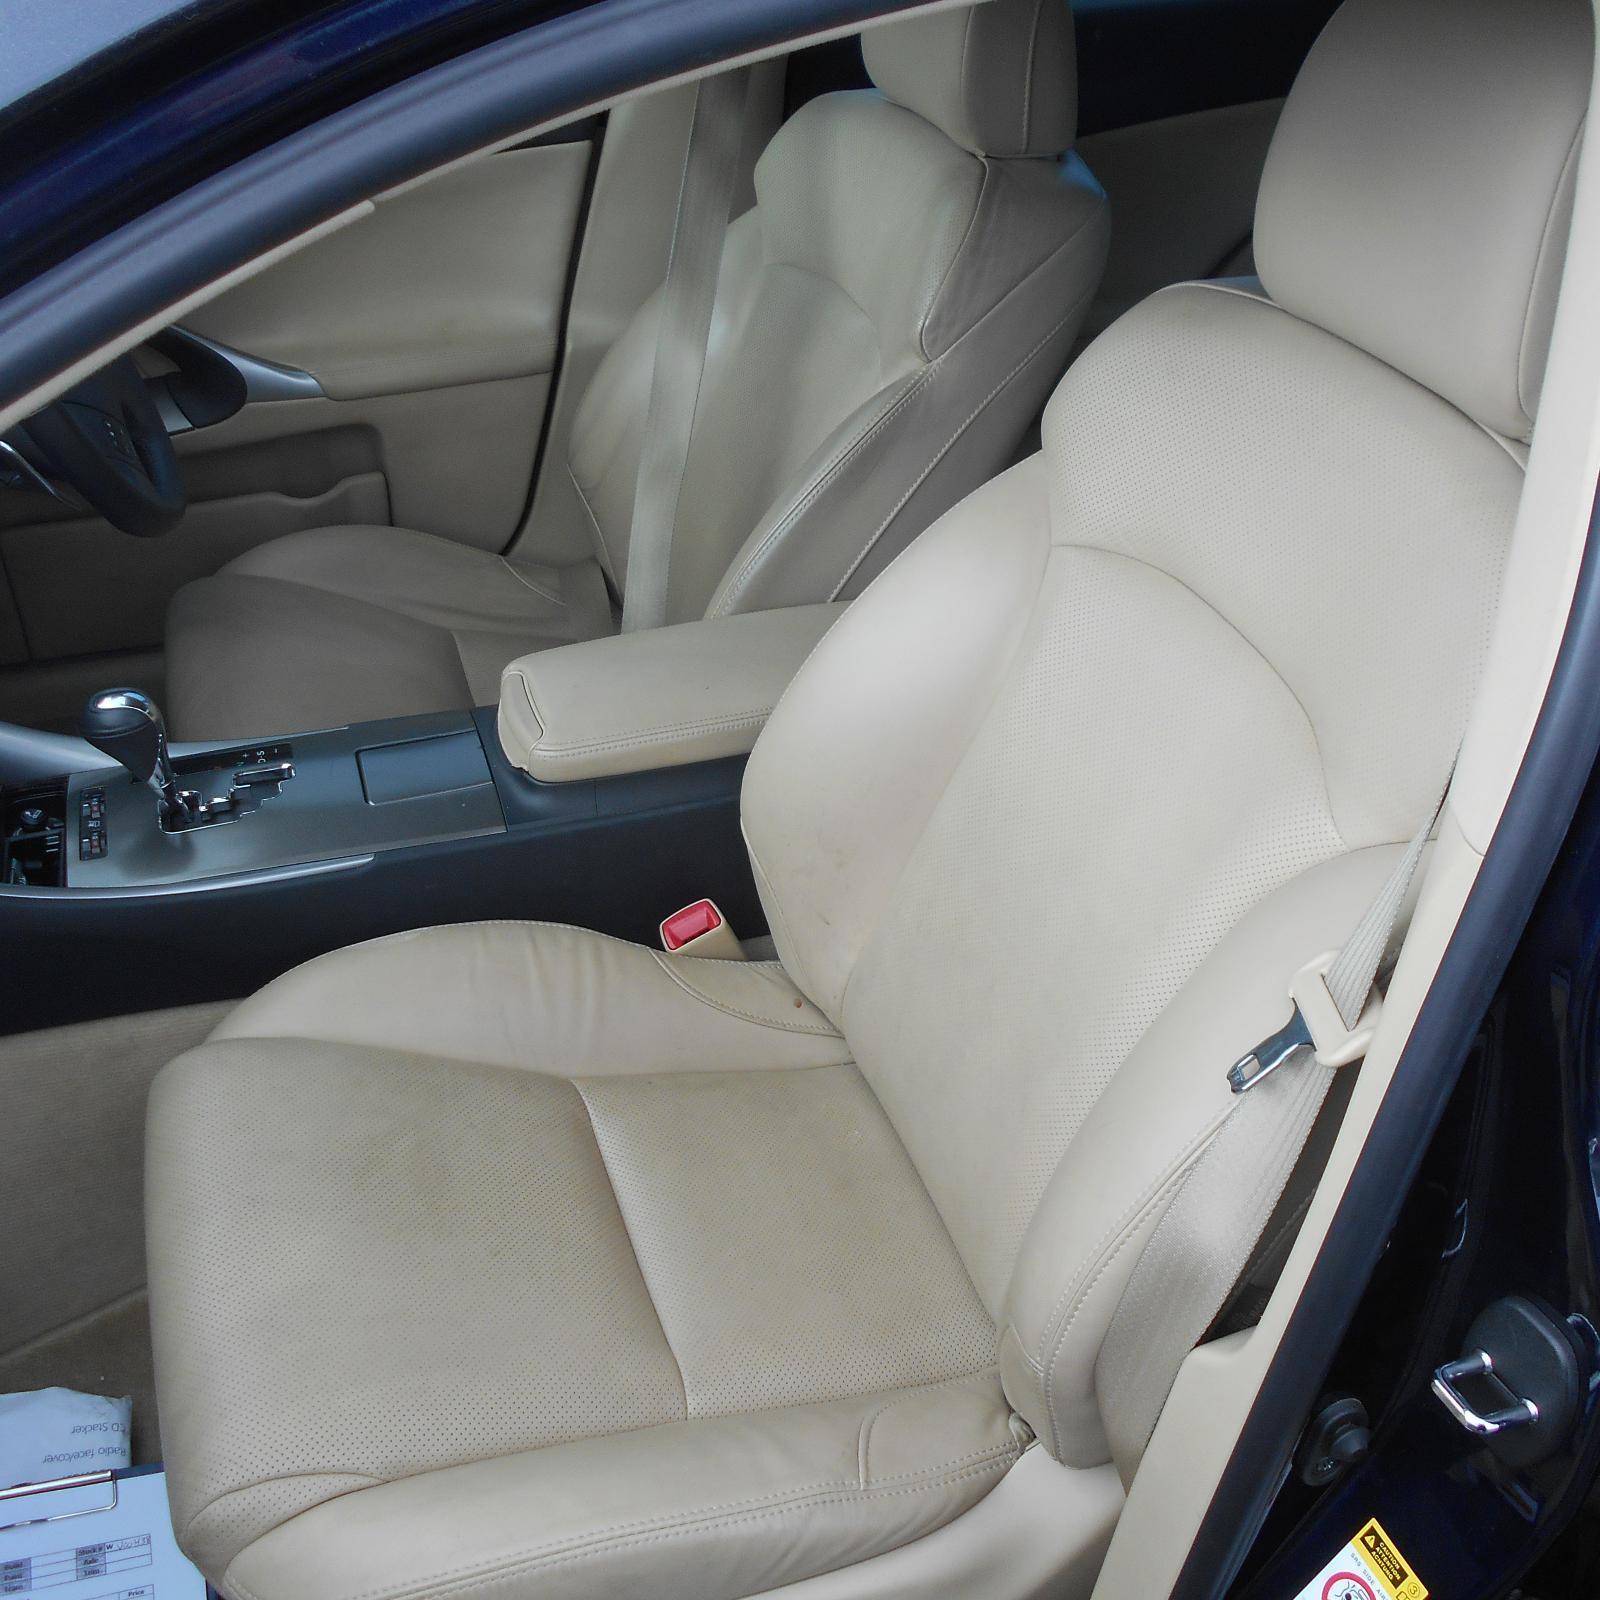 LEXUS IS250/IS250C, Front Seat, LH FRONT, GSE20R, IS250/IS350, LEATHER, BEIGE, PRESTIGE/X, 11/05-06/13